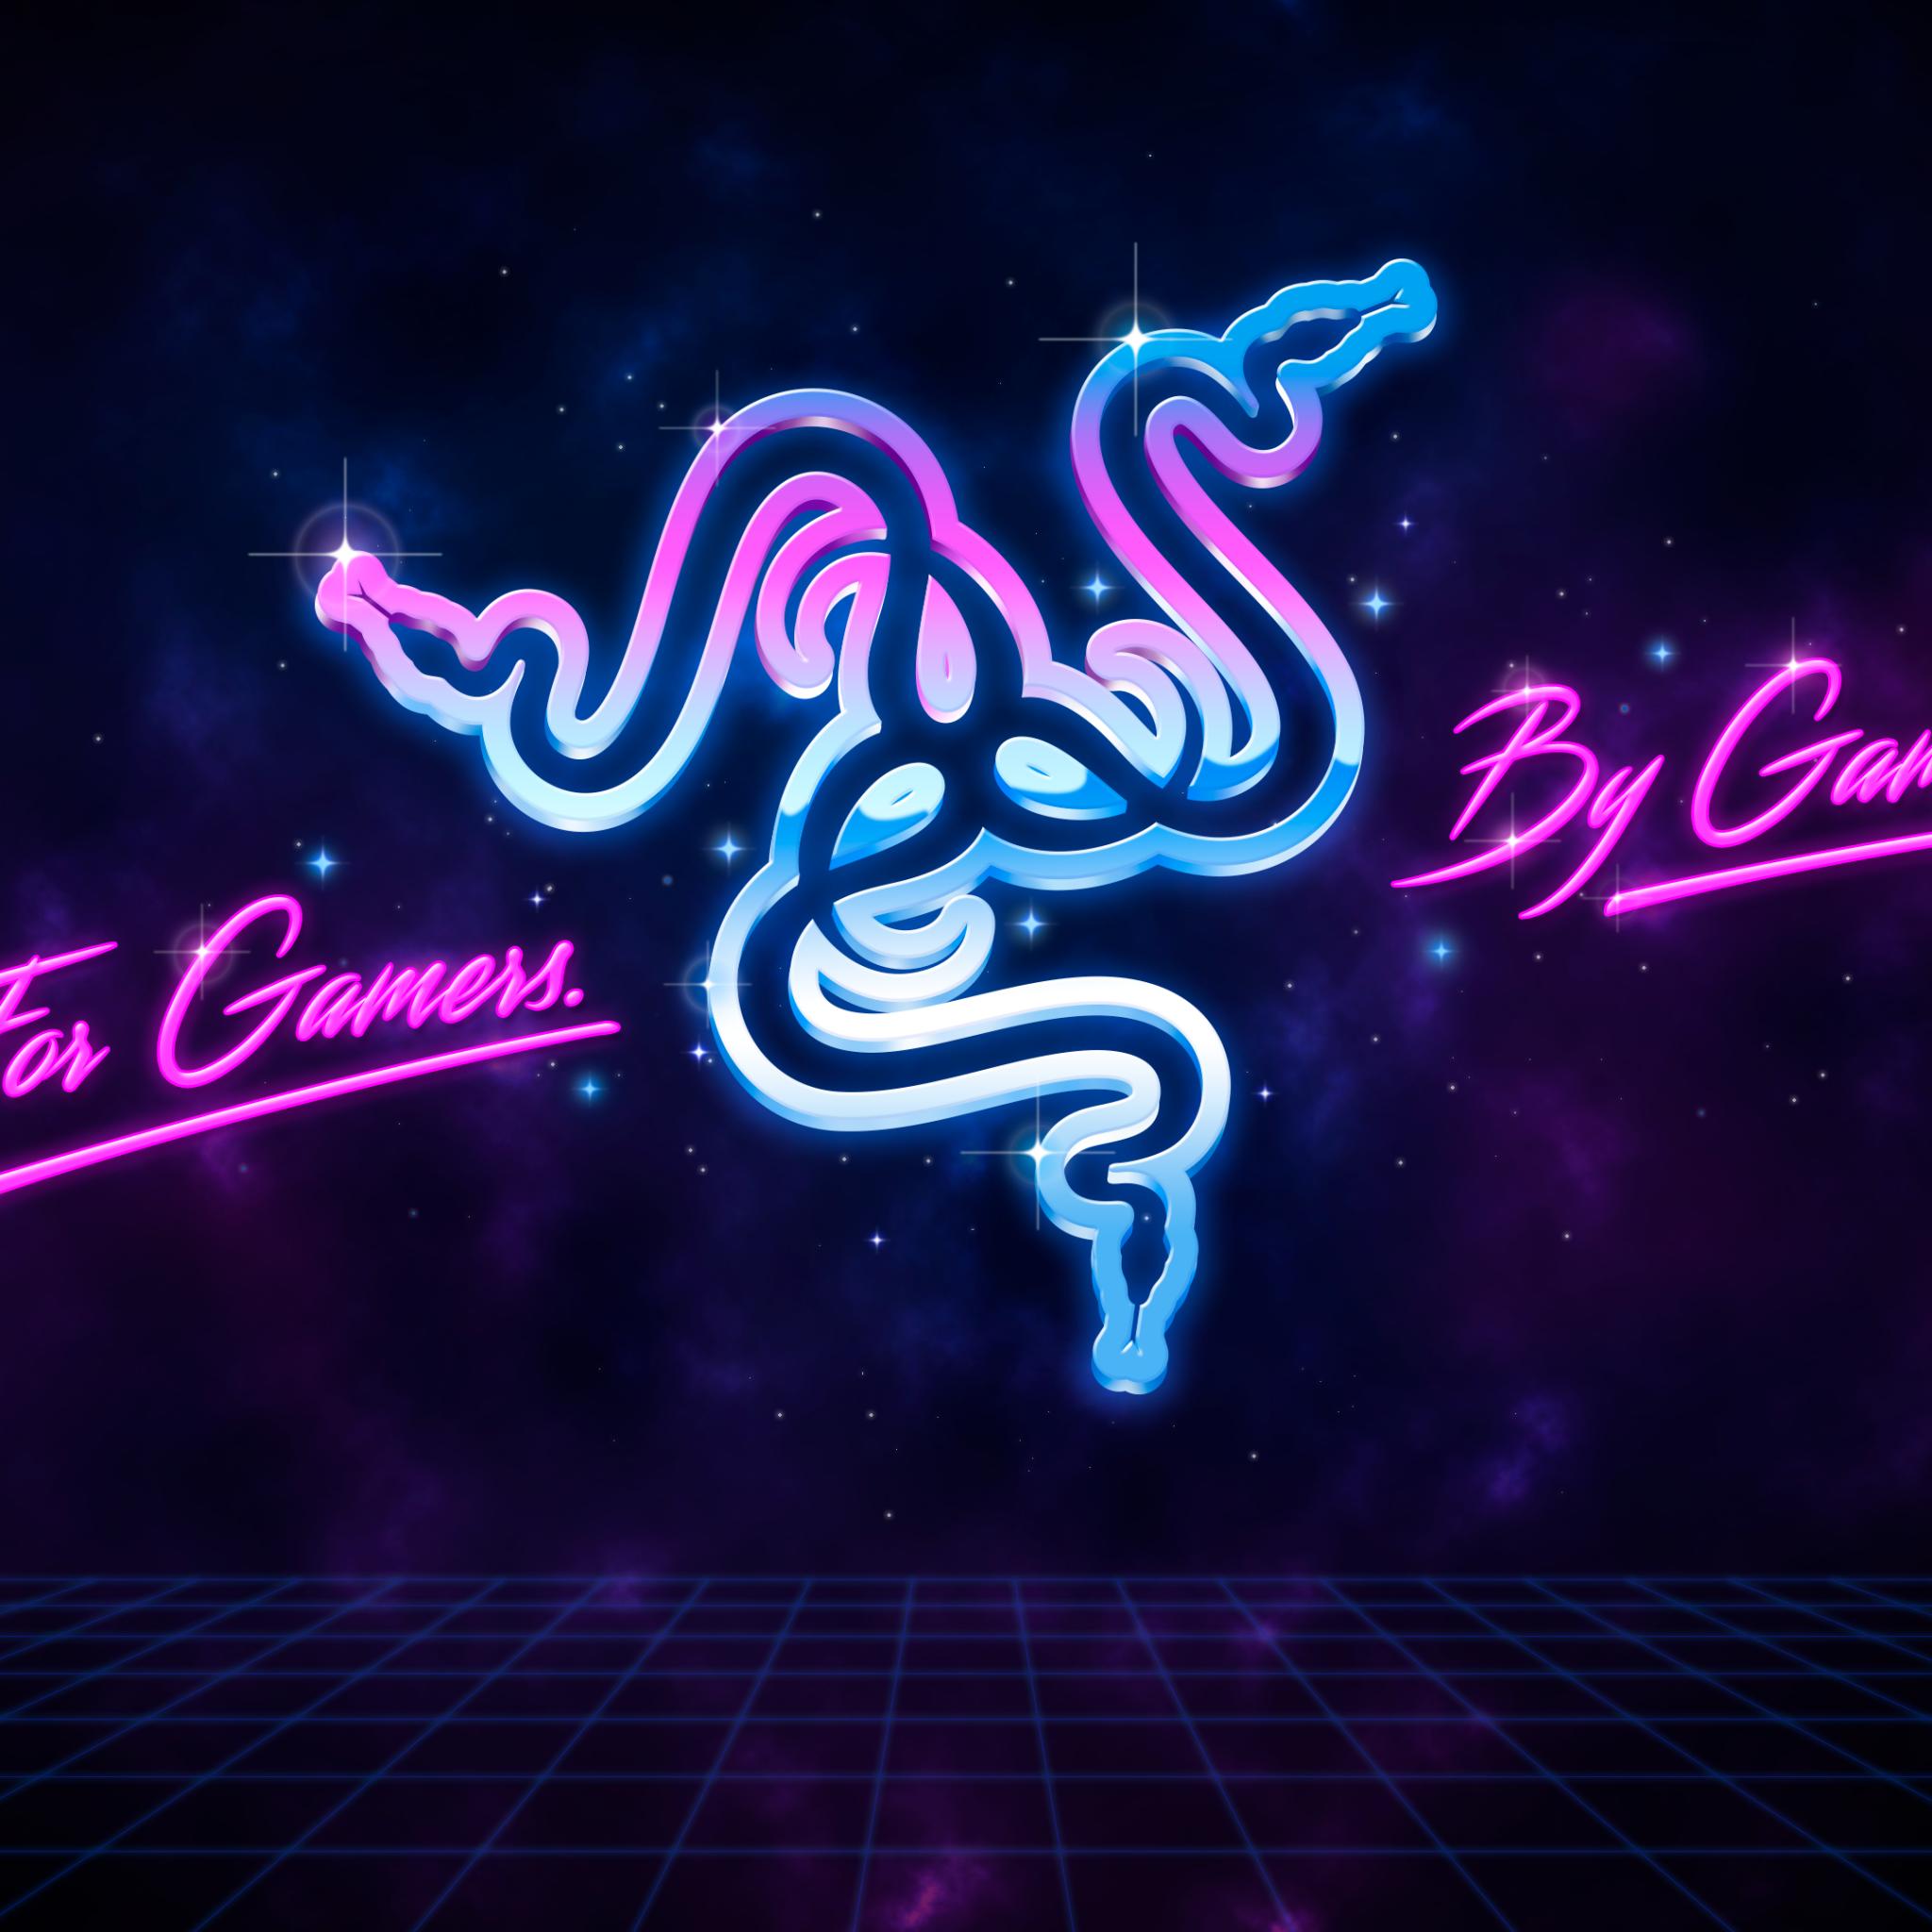 4K Wallpaper Razer, For Gamers By Gamers, Neon, Technology